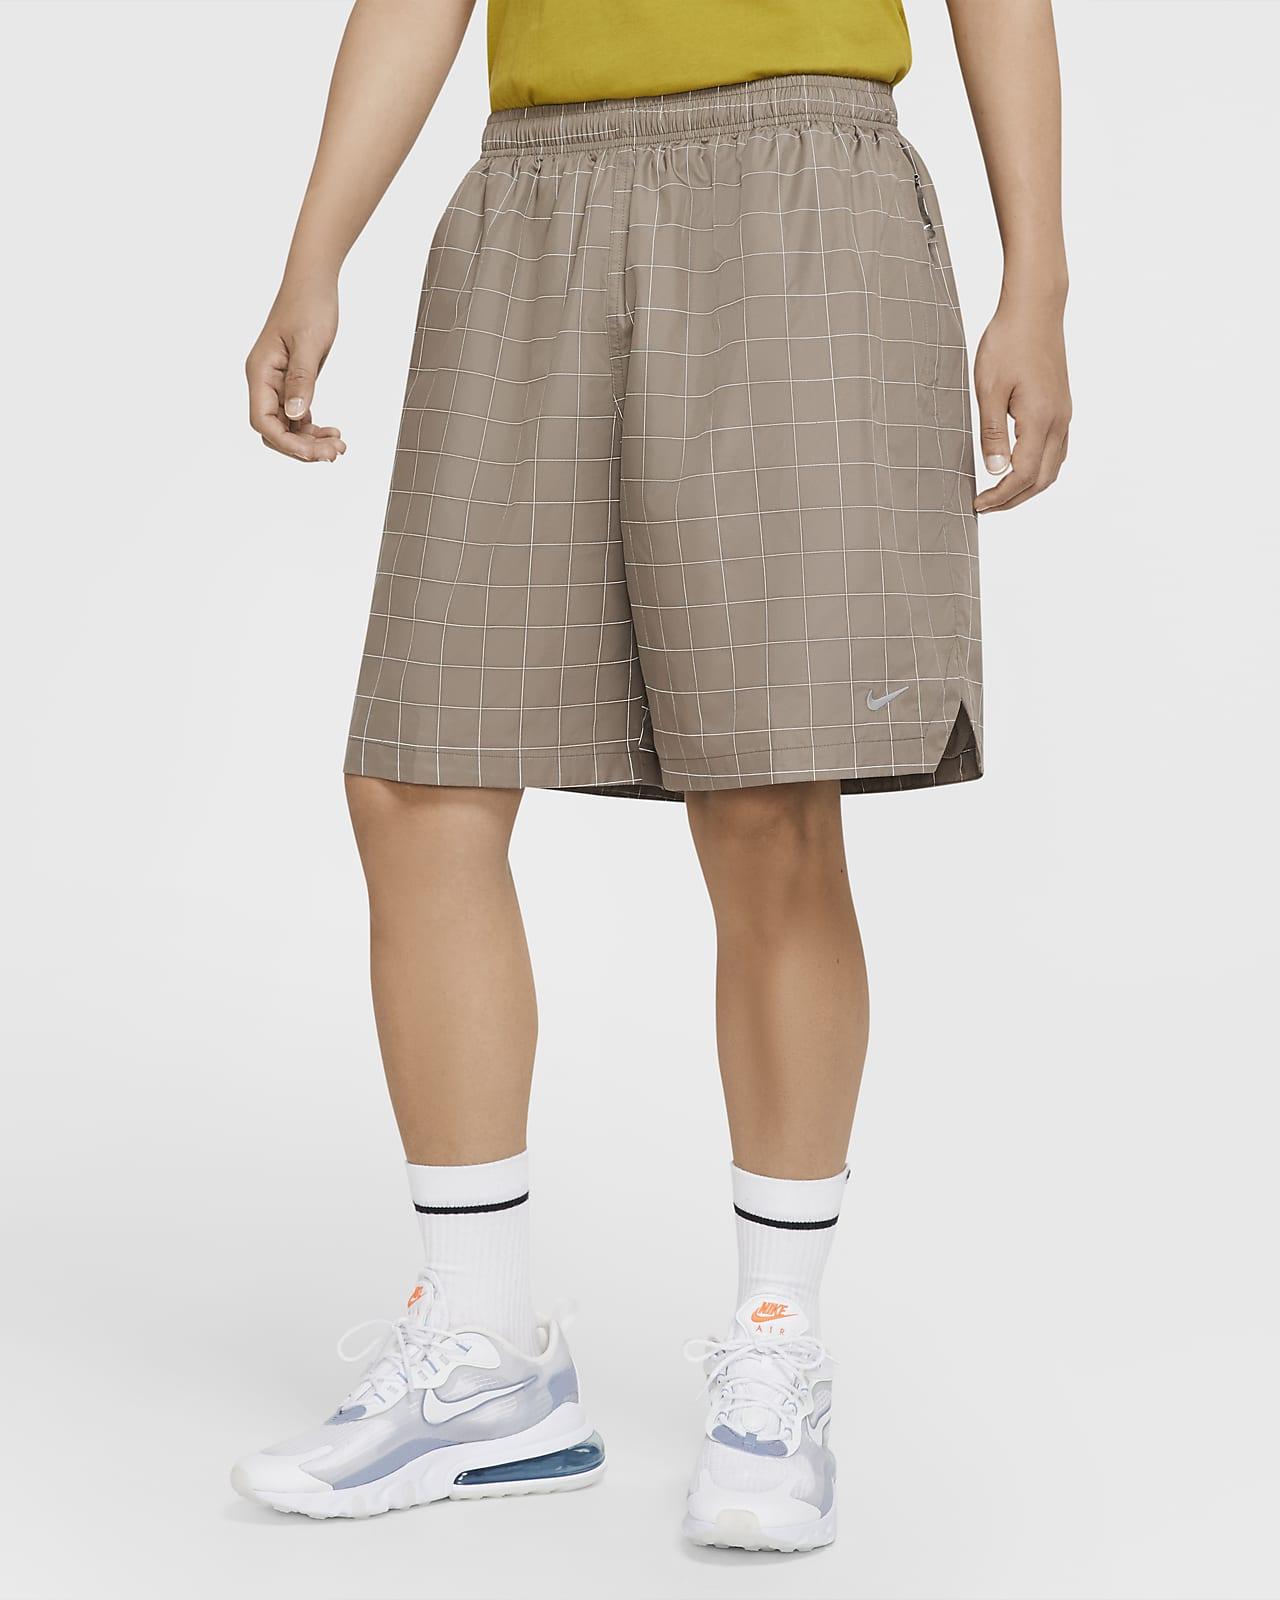 NikeLab Men's Flash Shorts